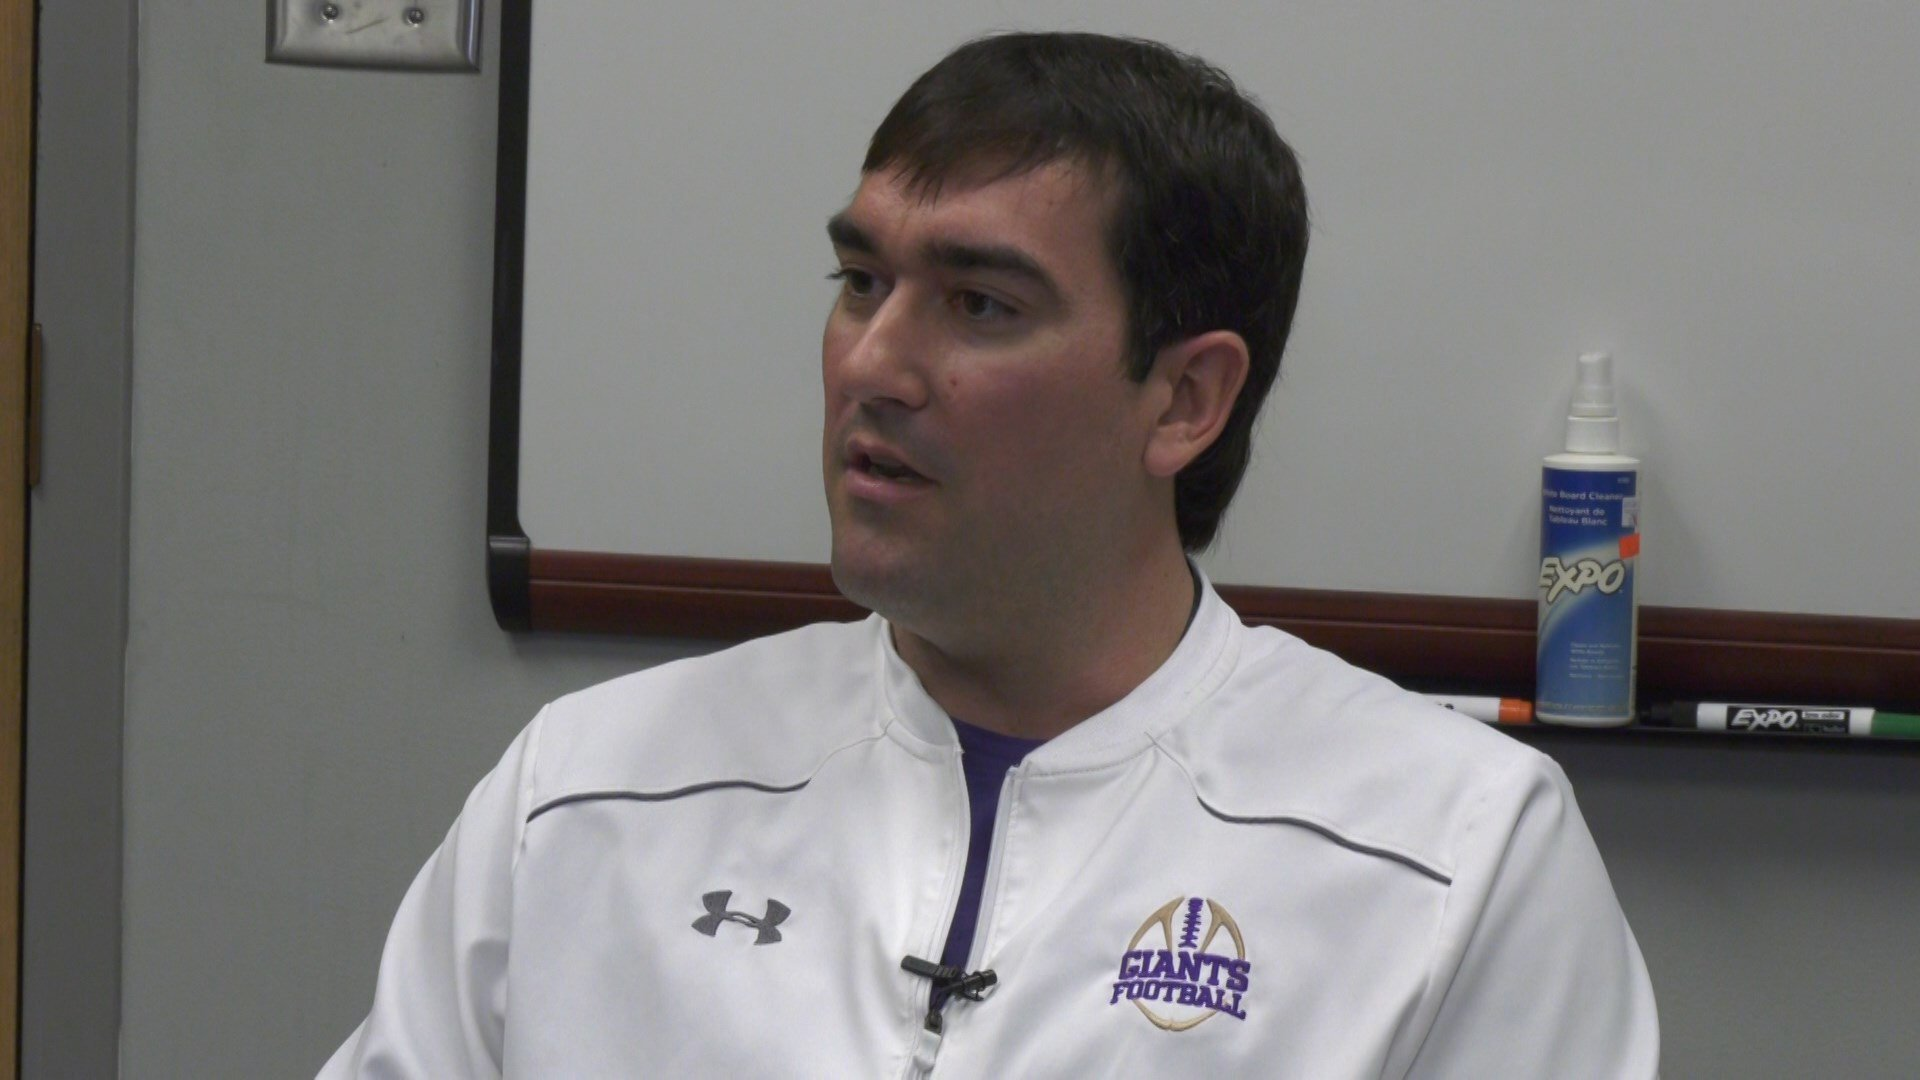 Shawn Moran is the new head football coach at Waynesboro High School